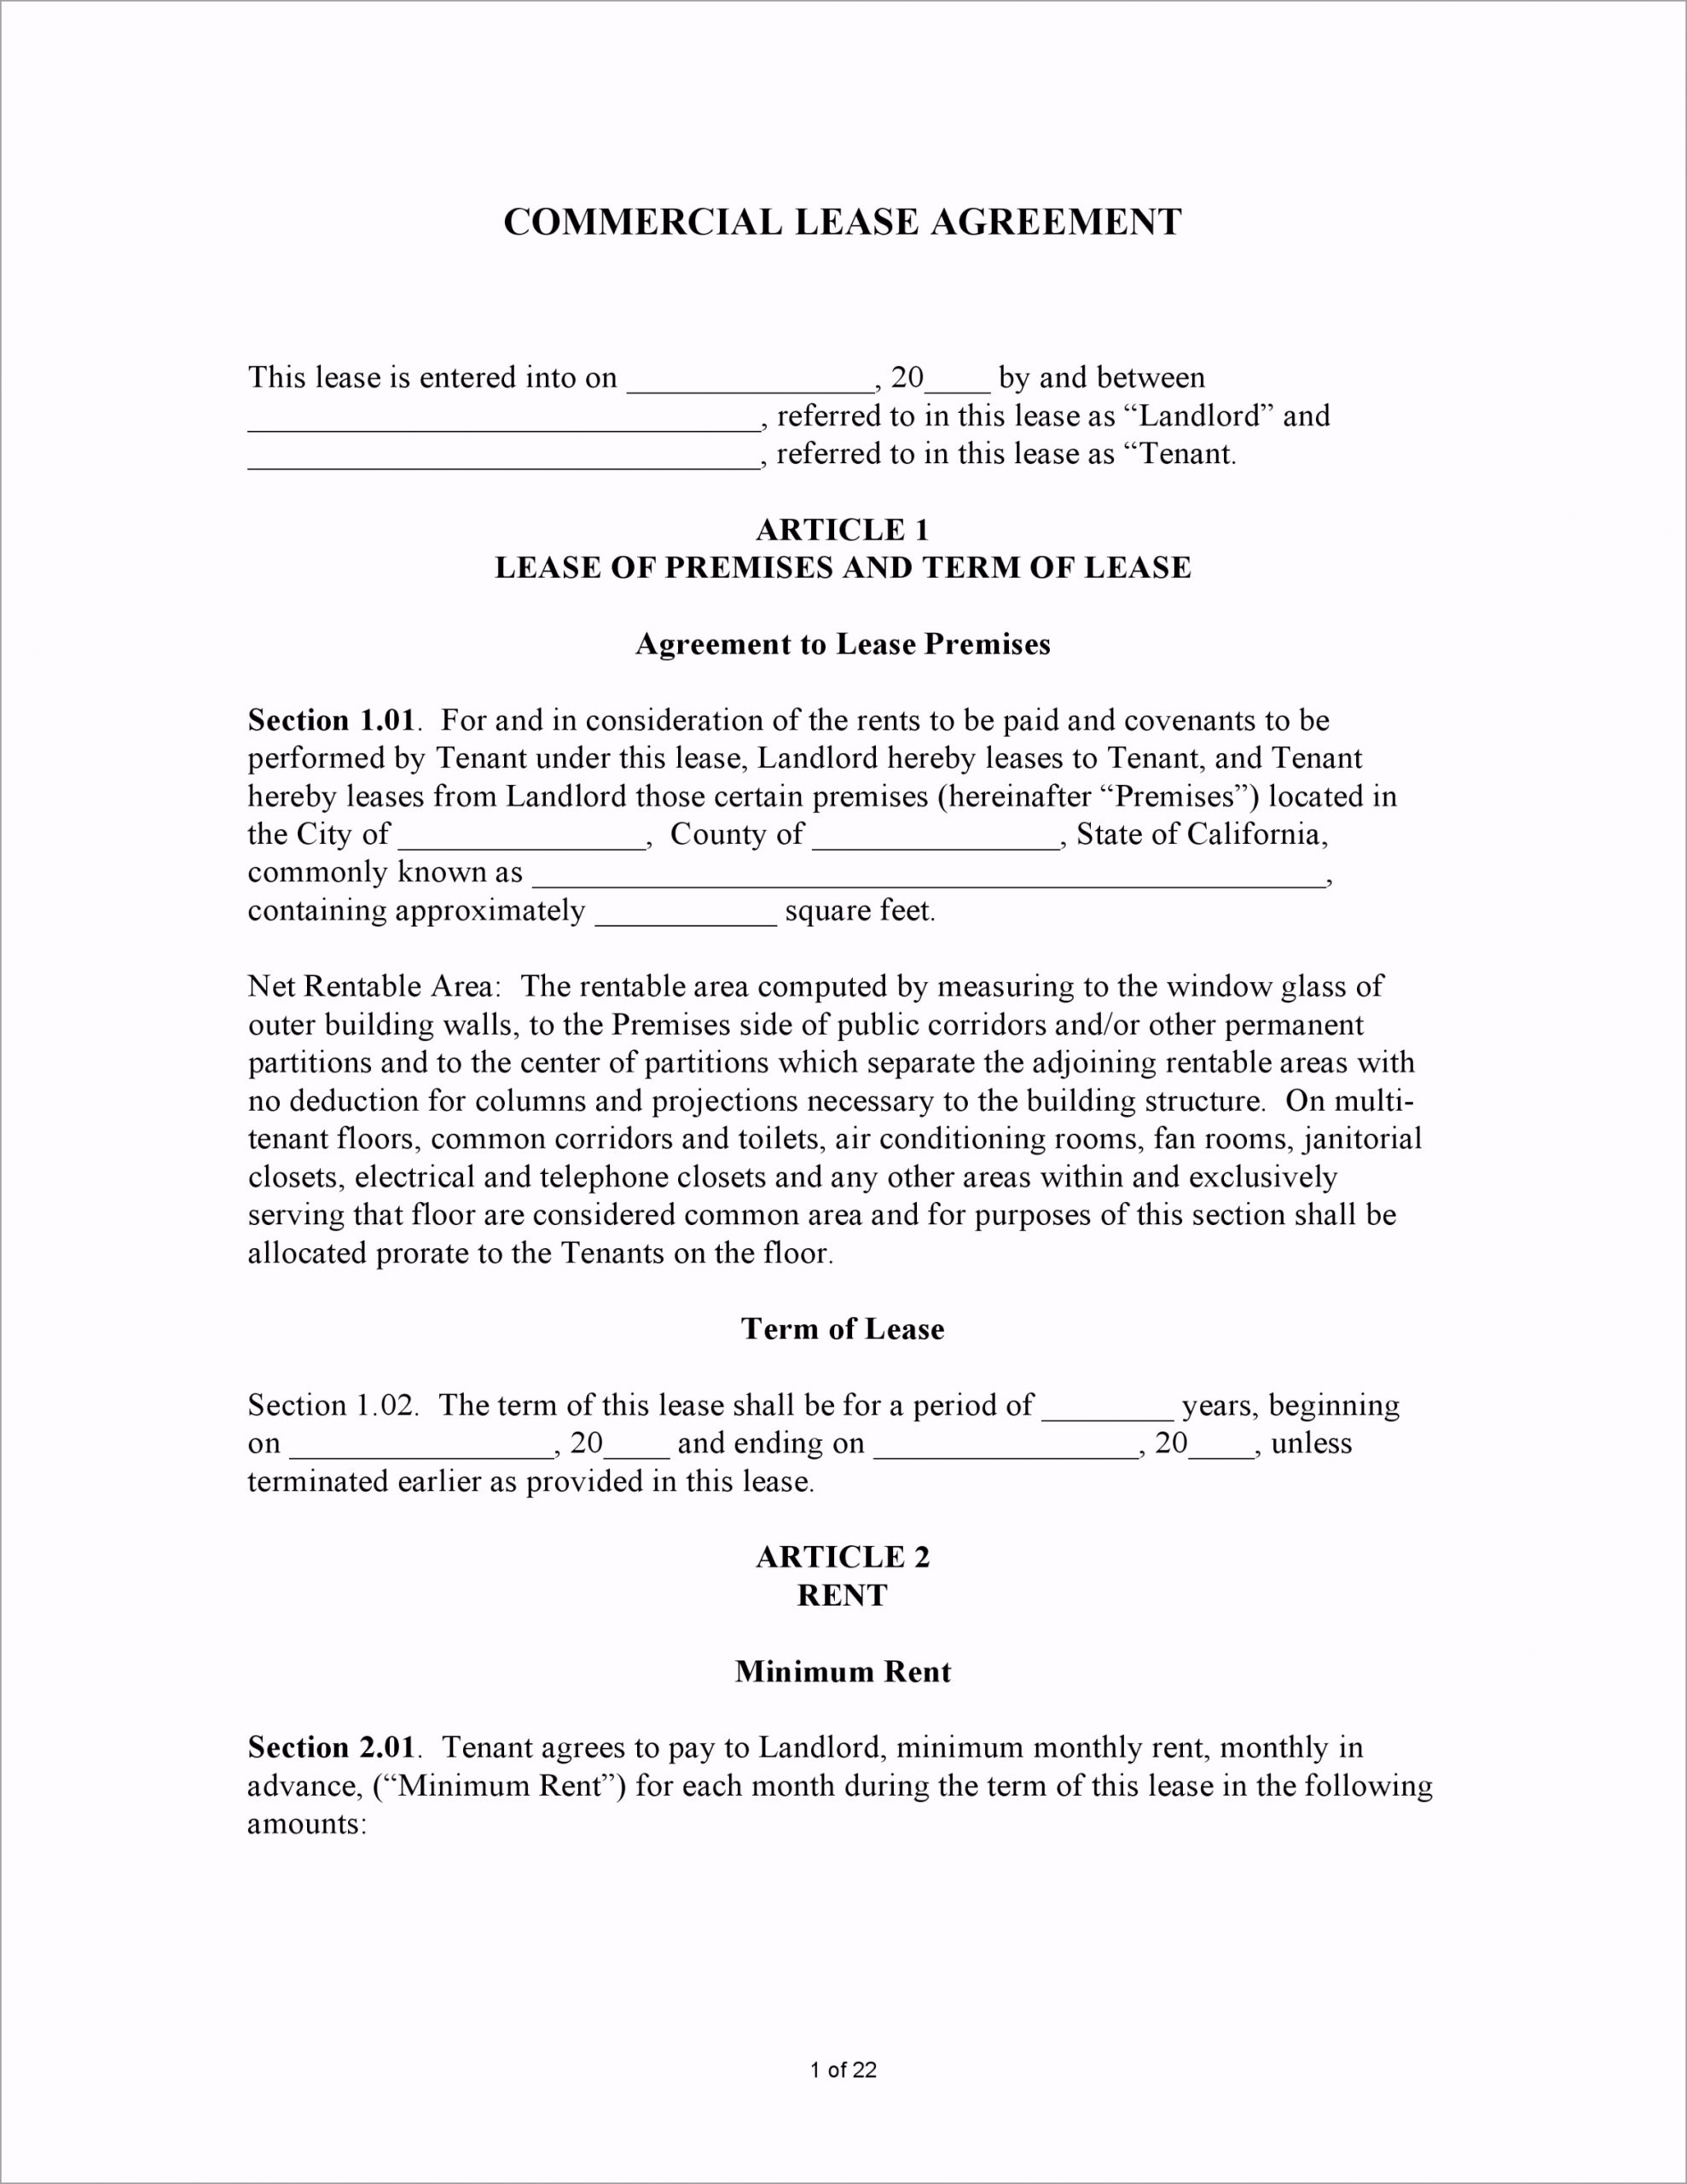 California mercial Lease Agreement uwaut